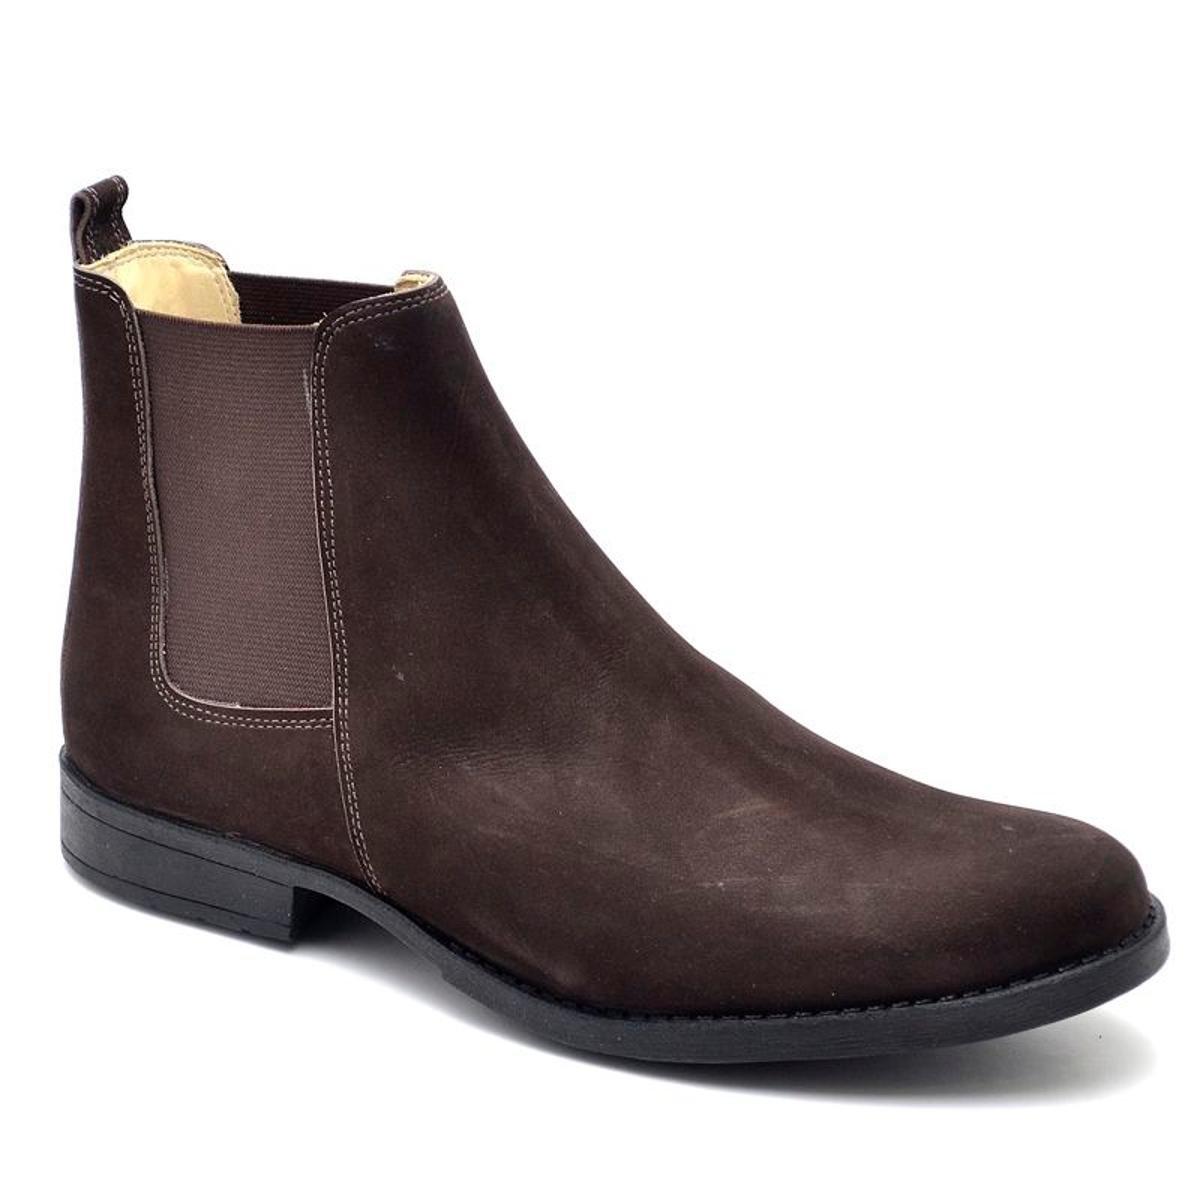 Bota Top Casual Bota Shoes Franca Marrom Top H1vR7qxf